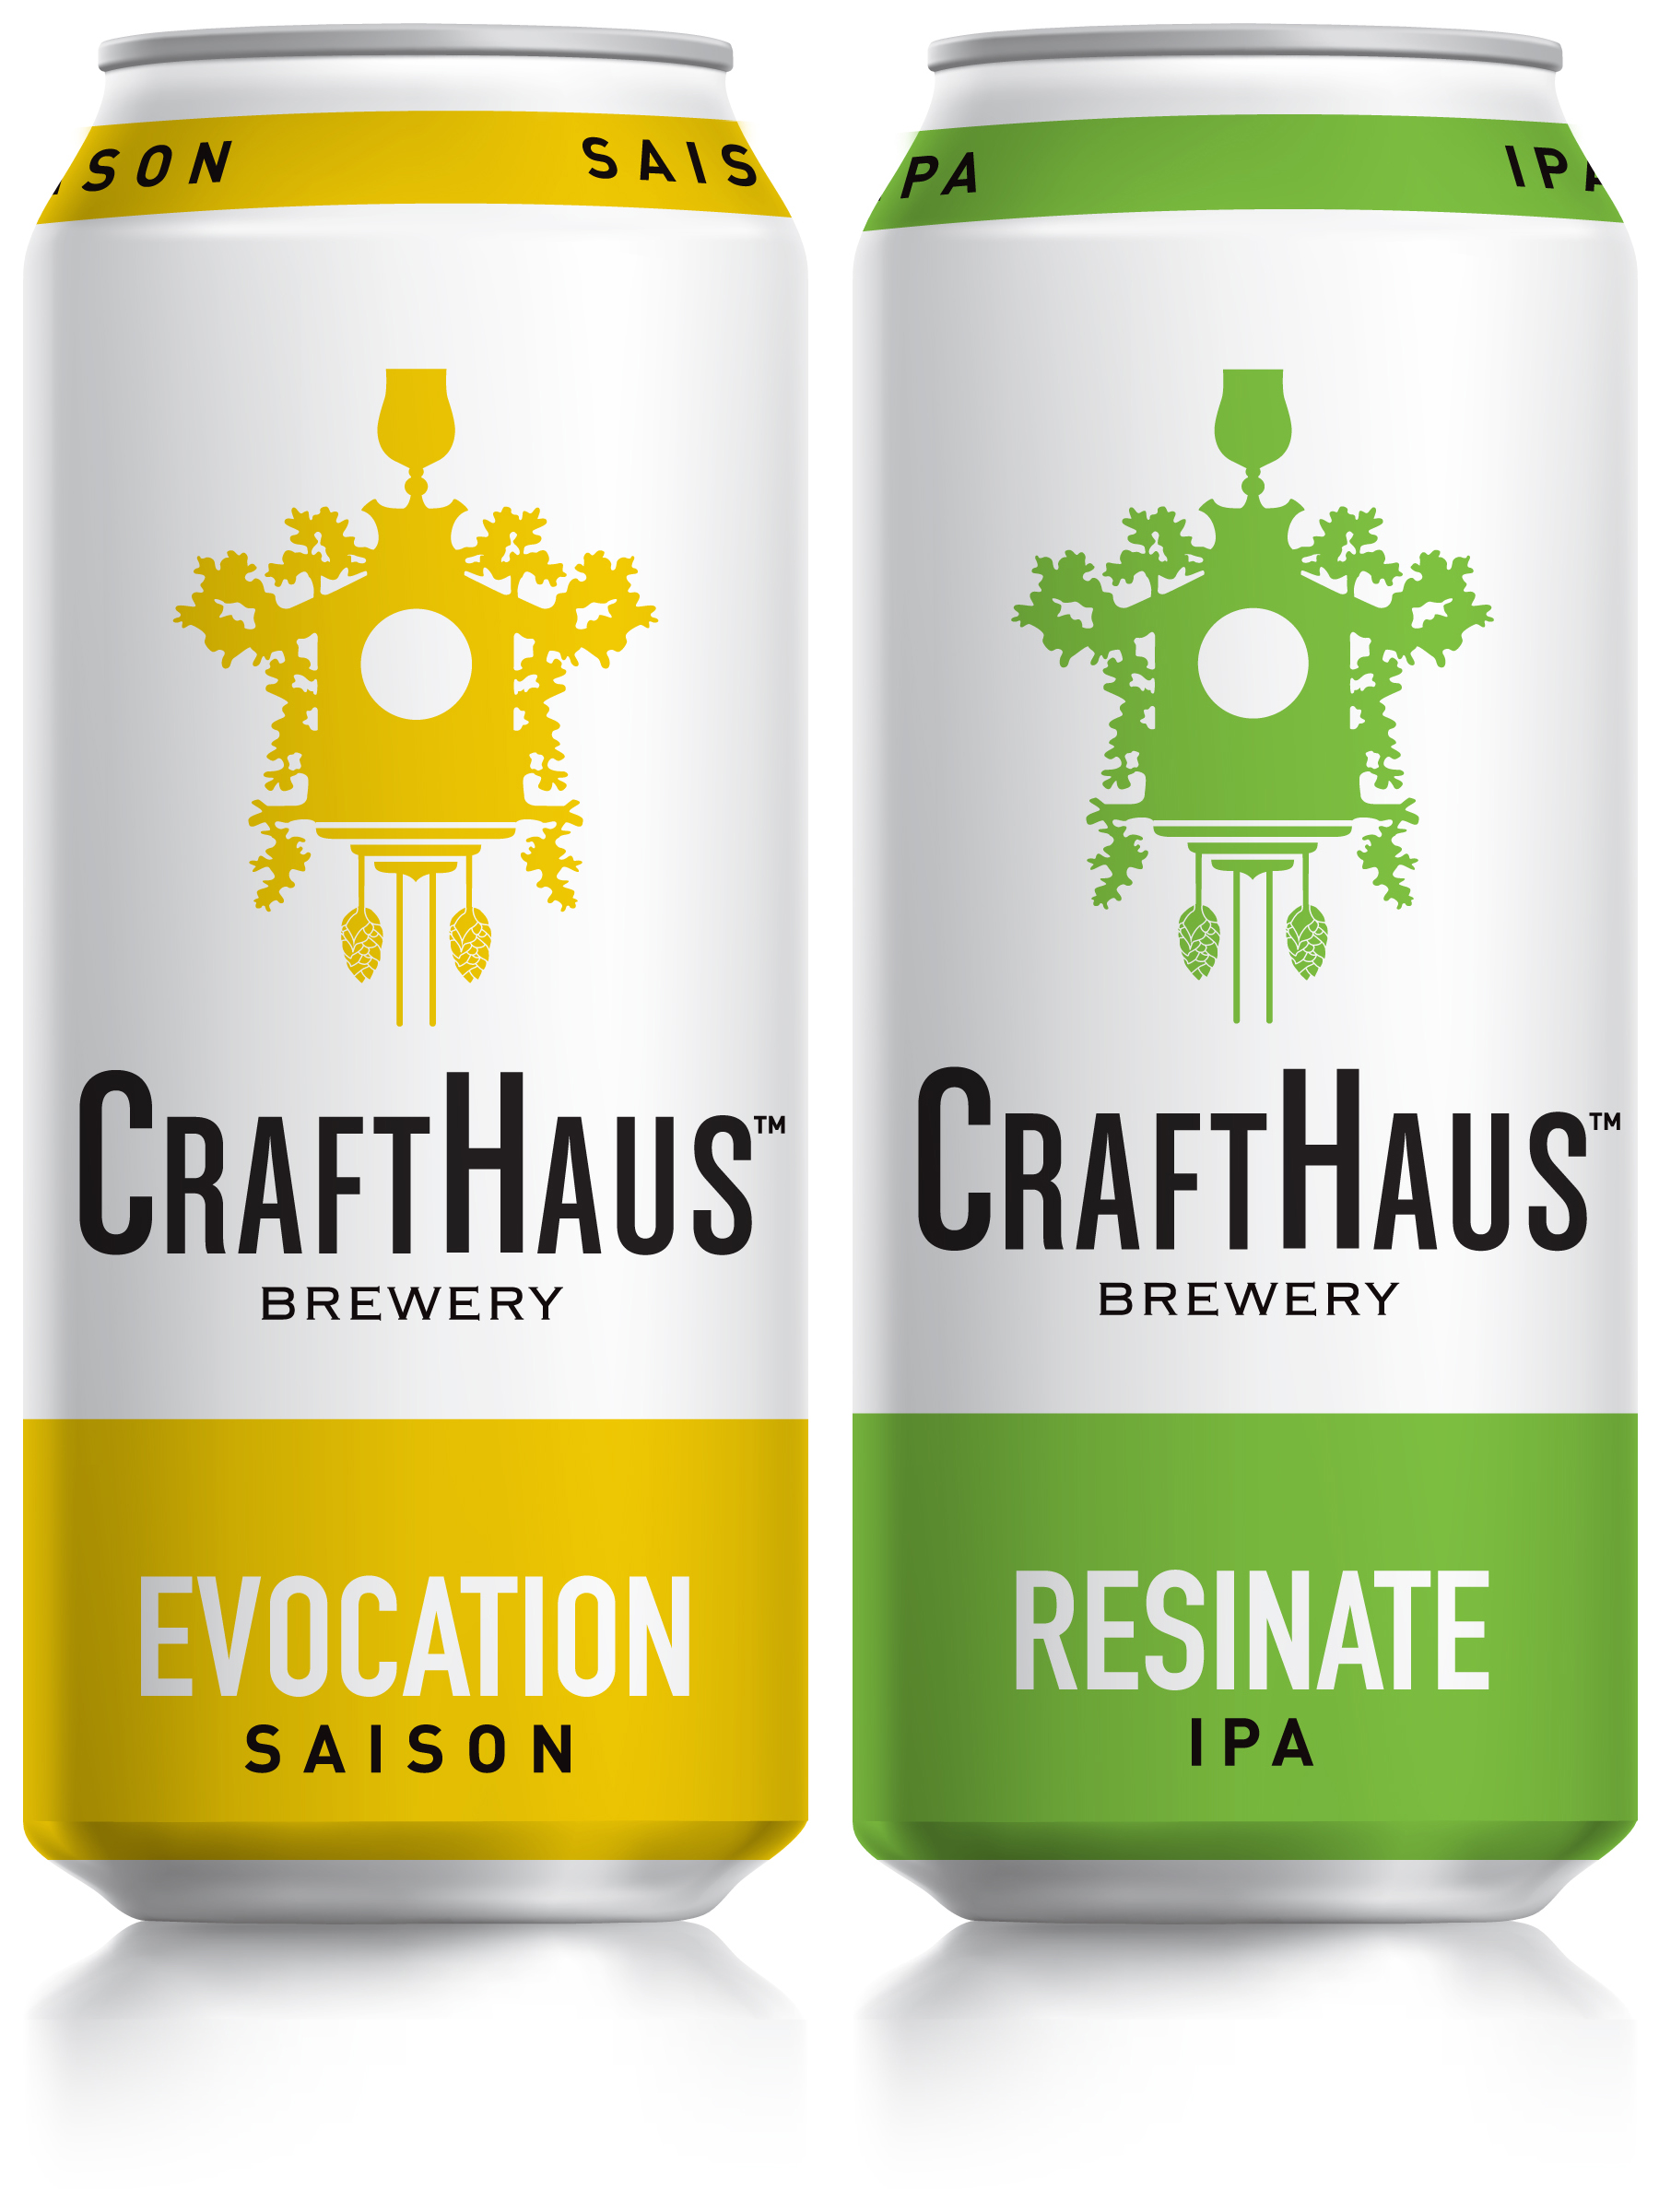 CraftHaus Brewery Evocation Saison and Resinate IPA